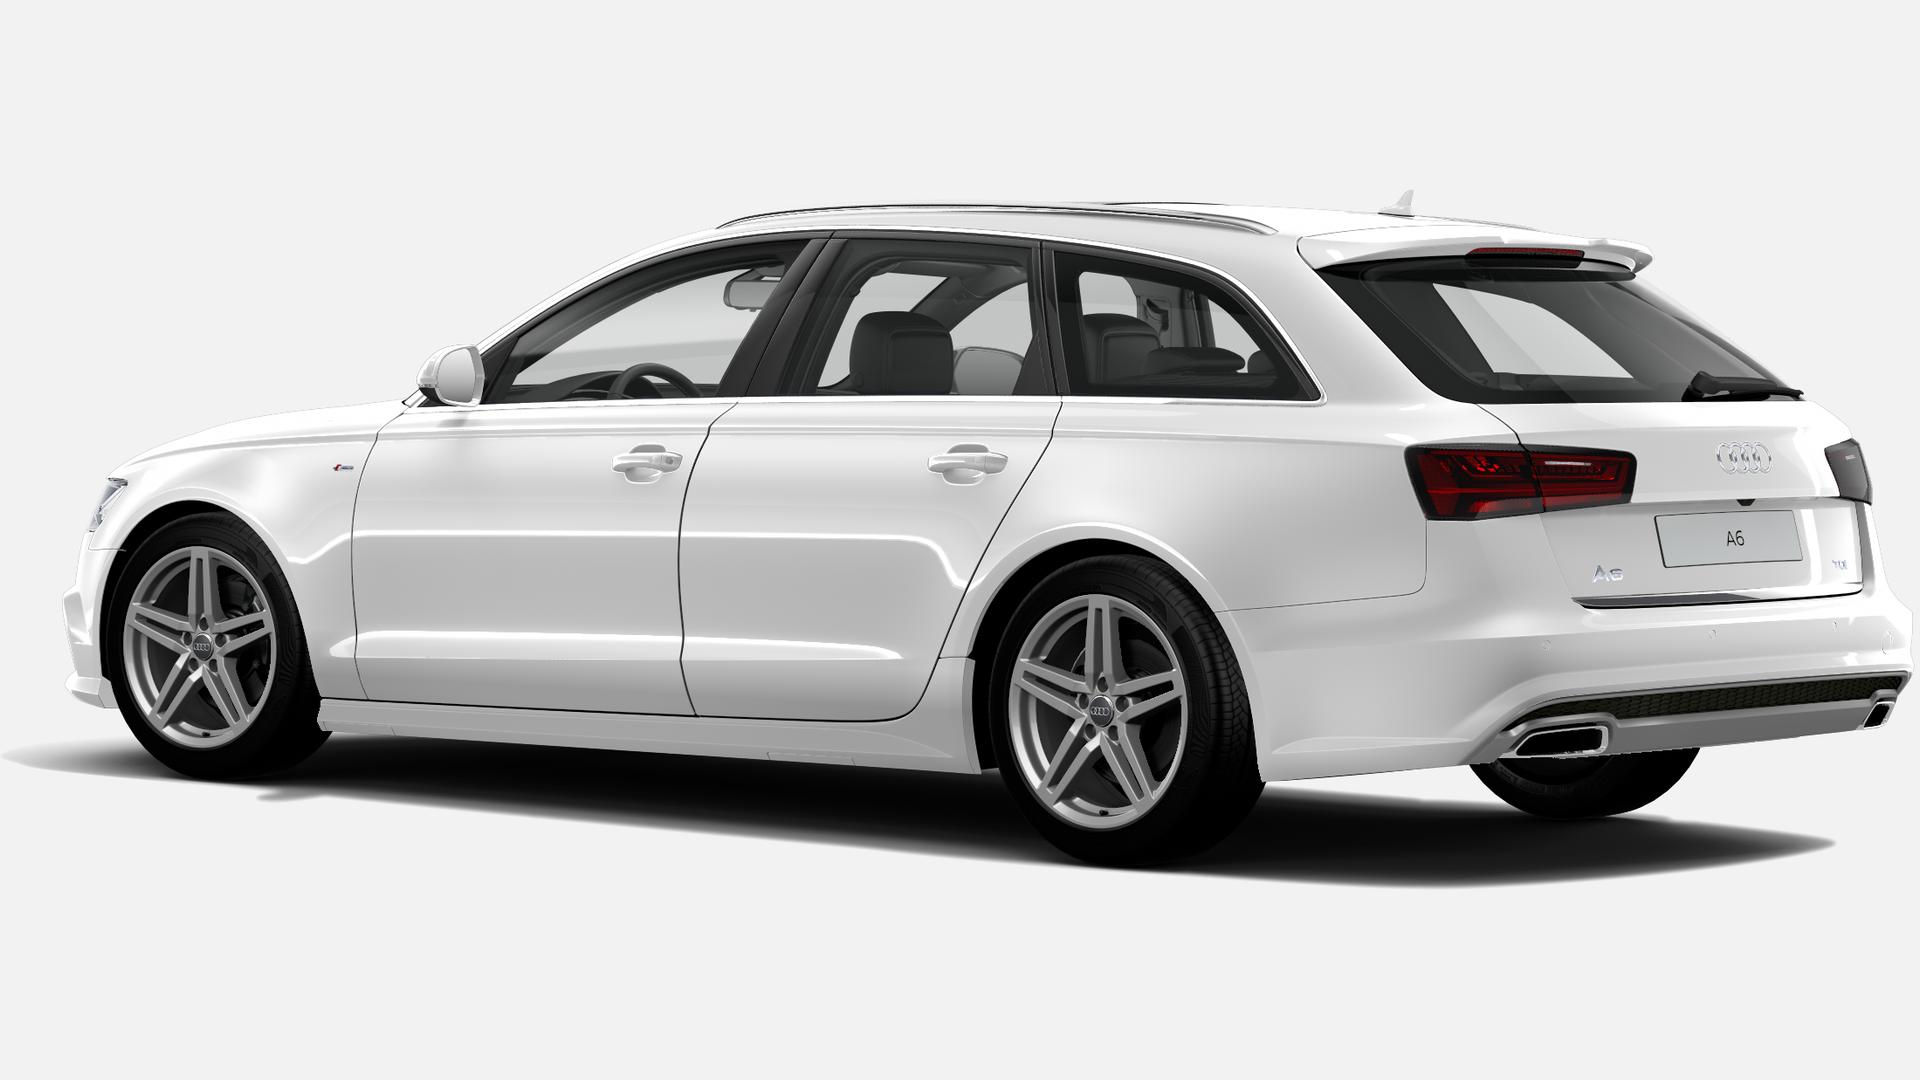 Vista Tres cuartos trasera izquierda de Audi A6 Avant 2.0 TDI line ultra S tronic 140 kW (190 CV)